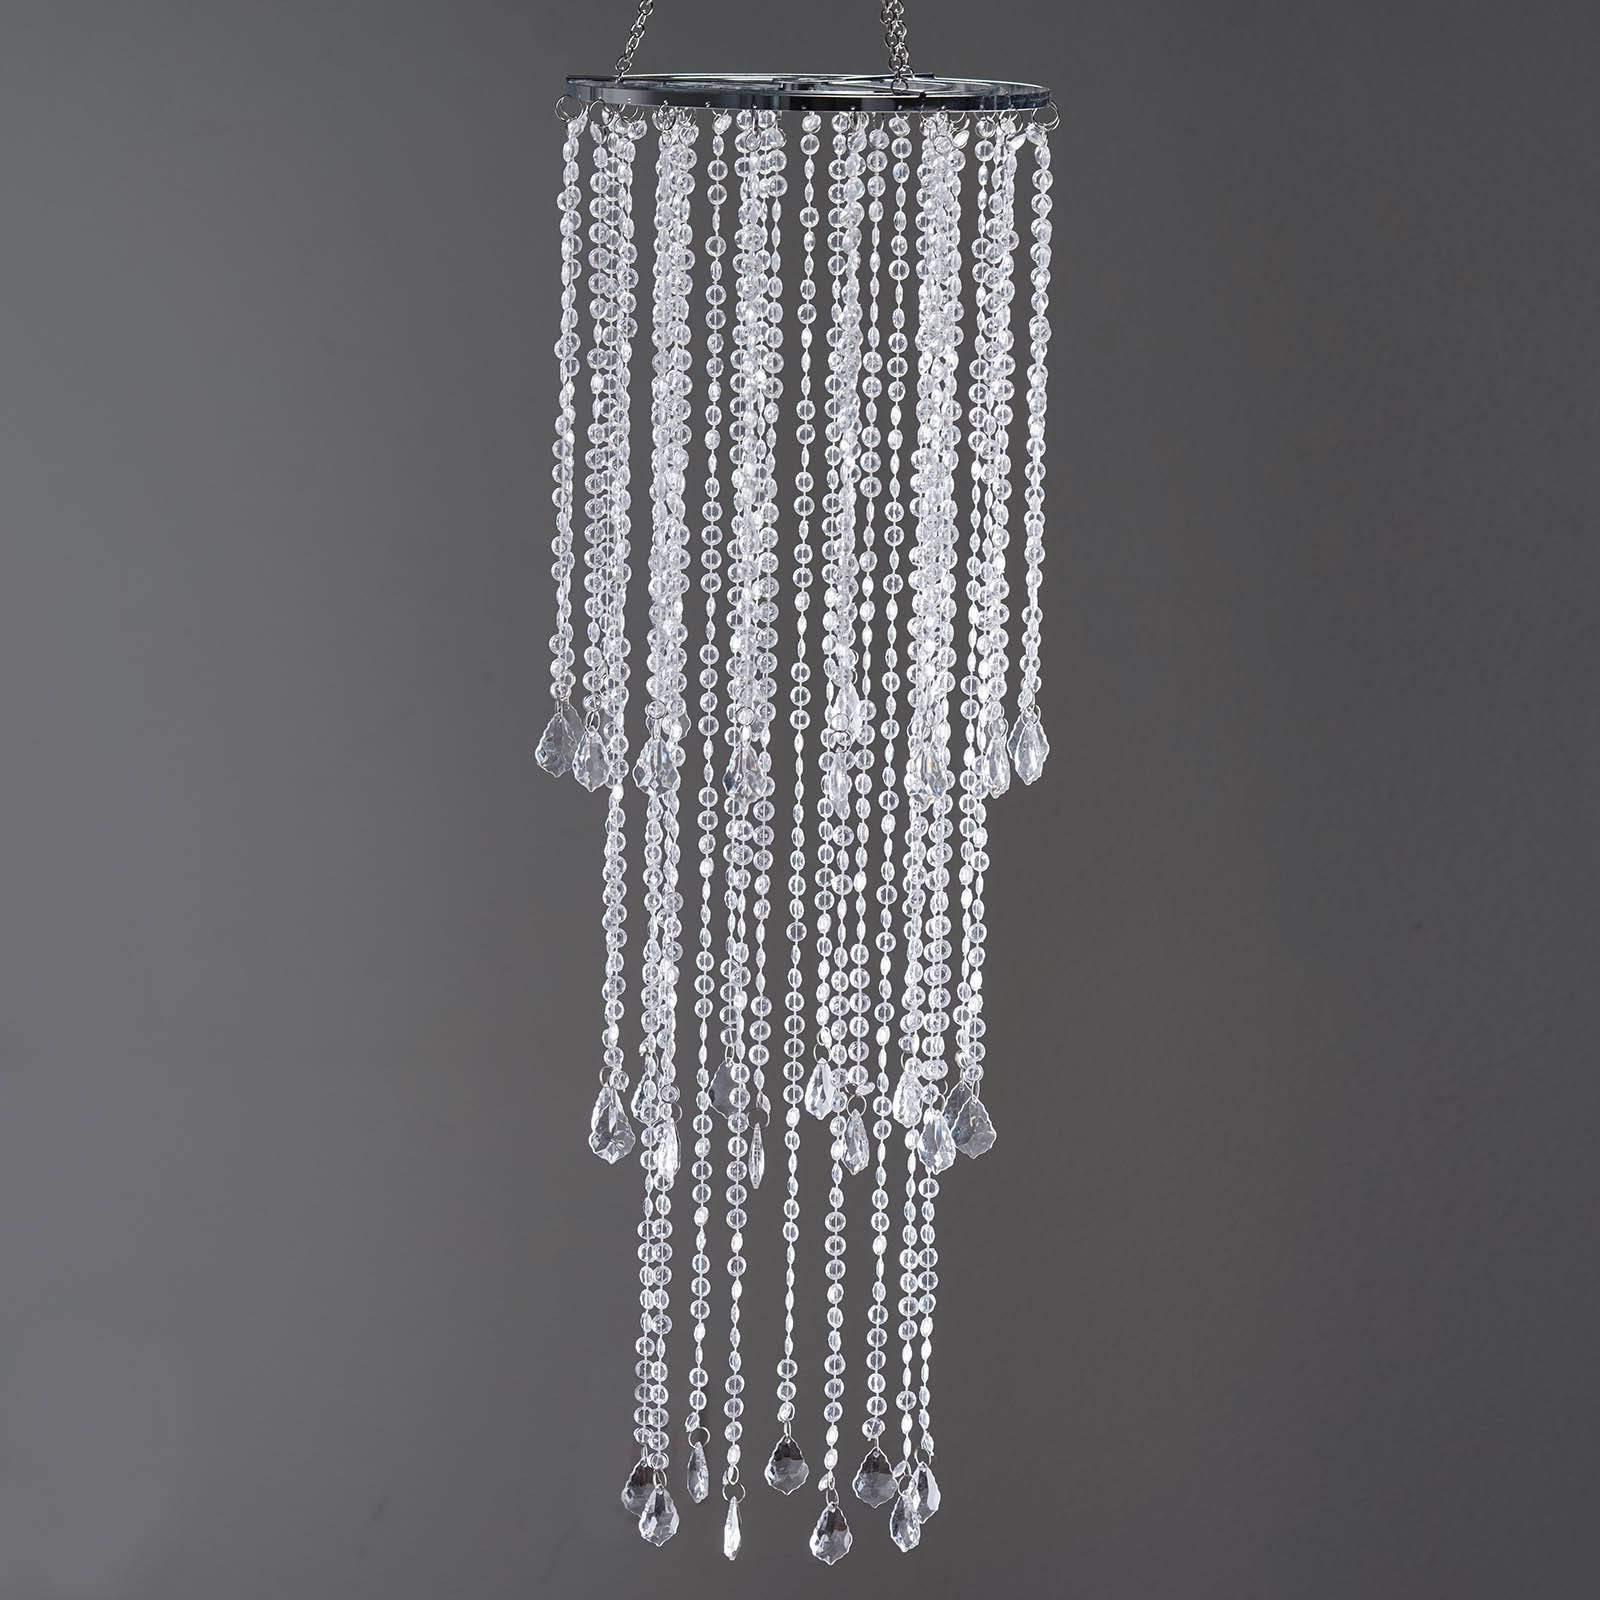 Efavormart 36'' Tall Acrylic Diamond Crystal Chandelier Wedding Table Centerpiece W/Stands